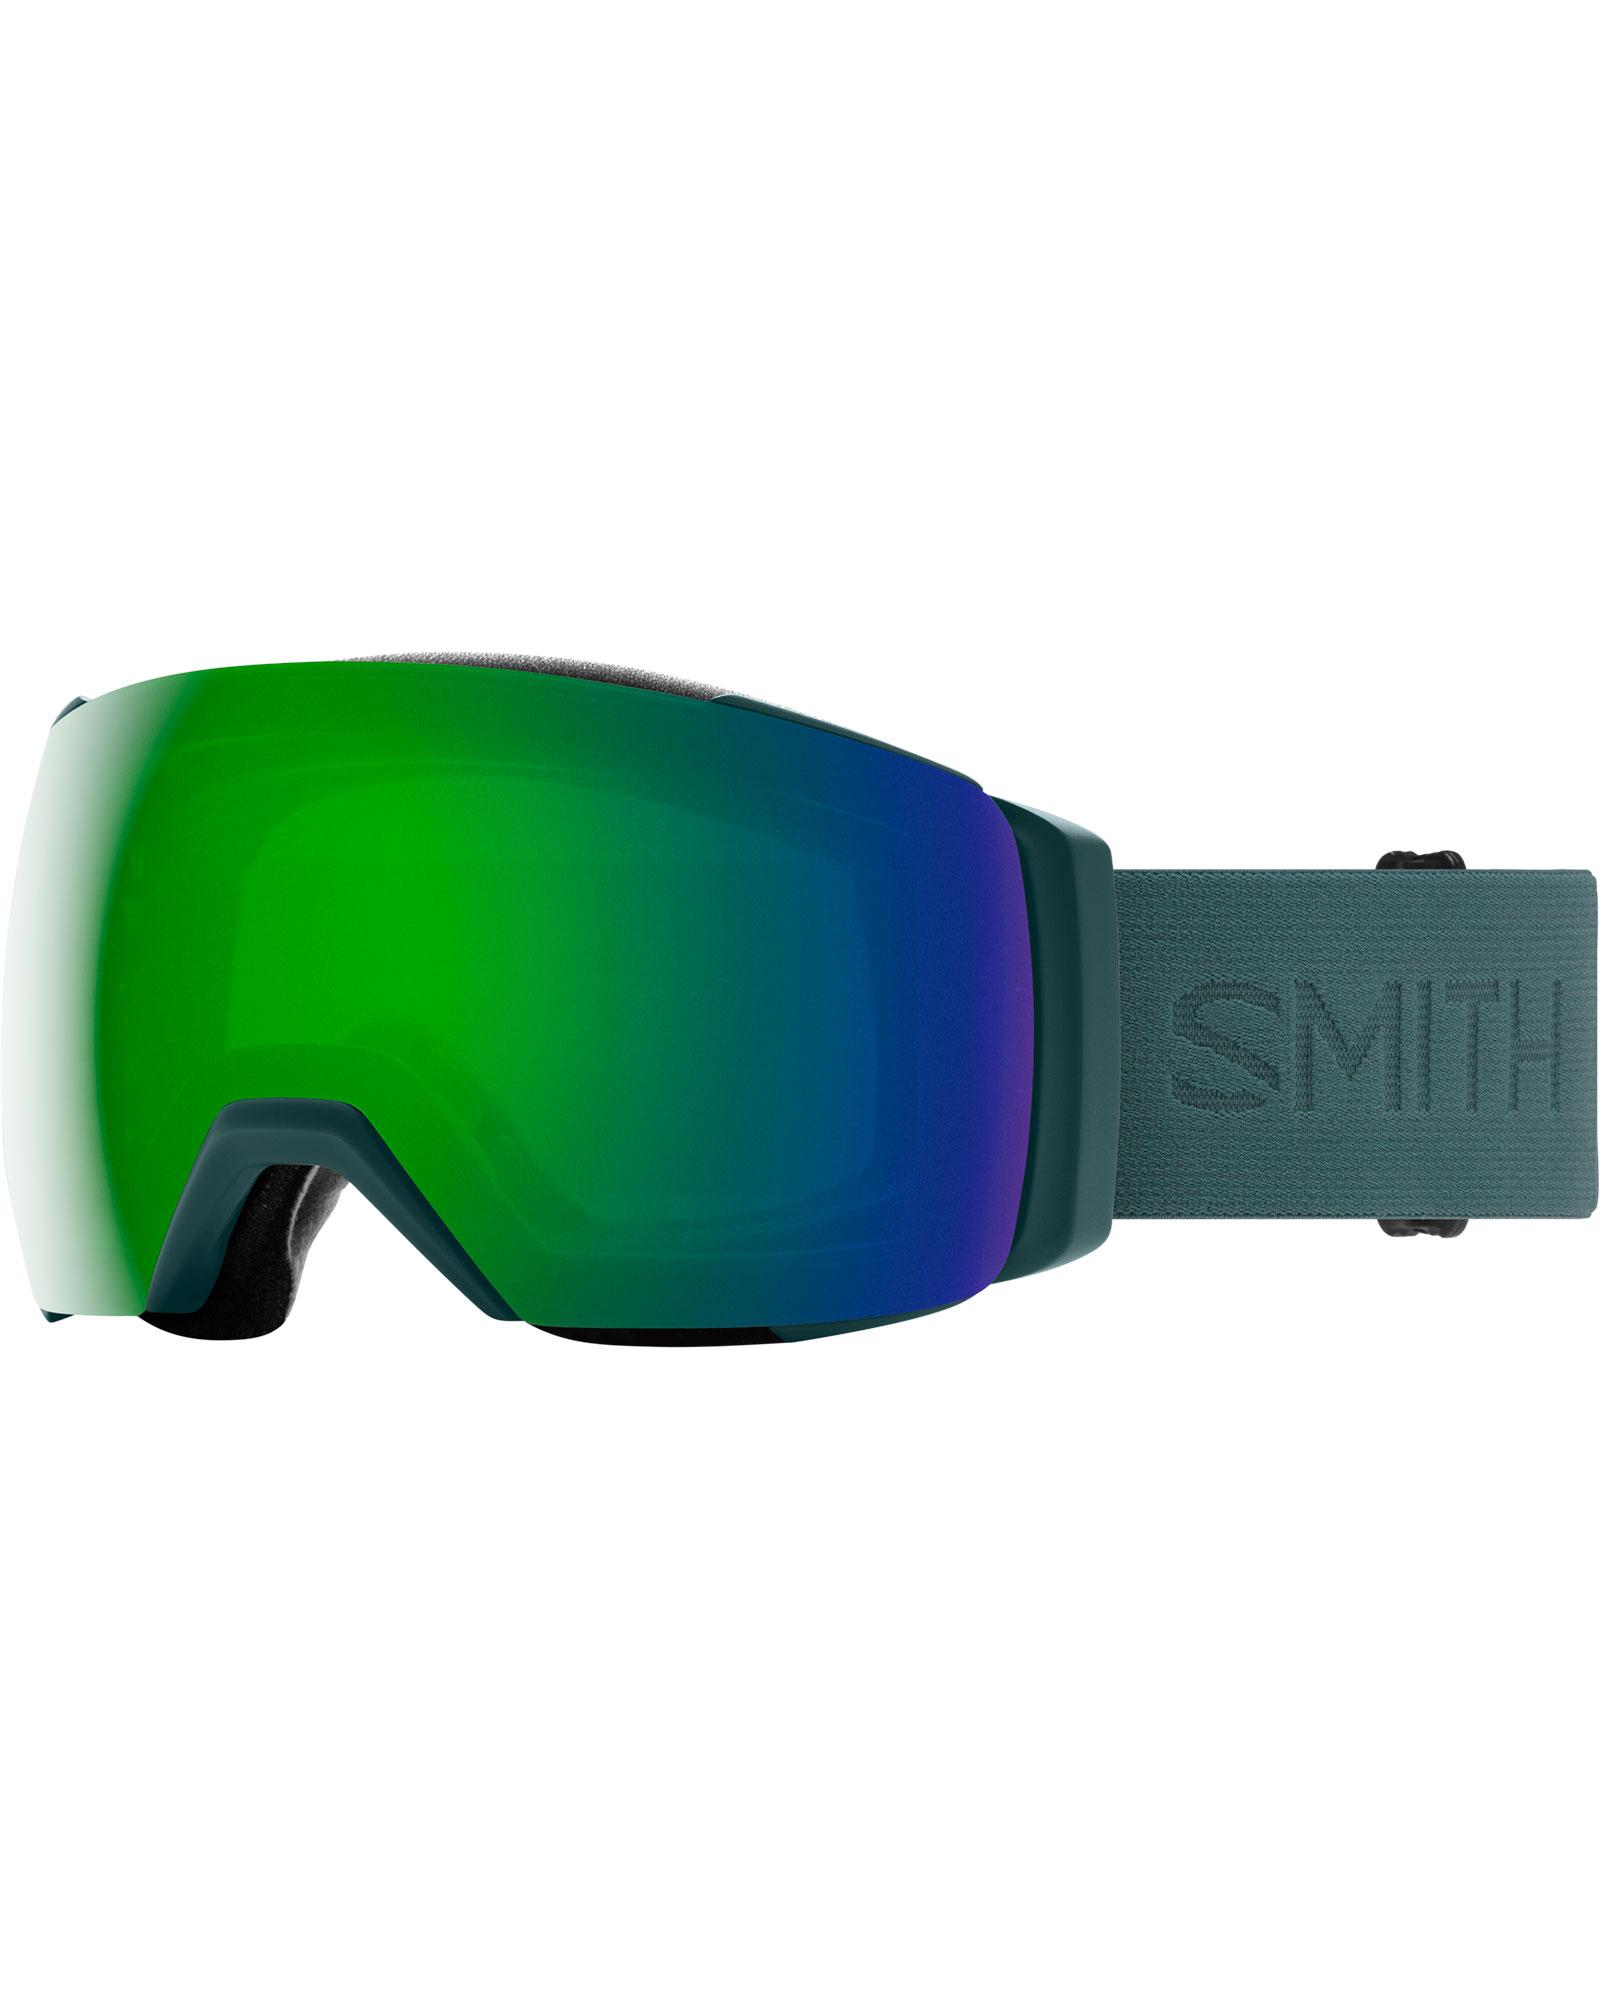 Smith I/O MAG XL Spruce Flood / ChromaPop Sun Green Mirror + ChromaPop Storm Rose Flash Goggles 2020 / 2021 0